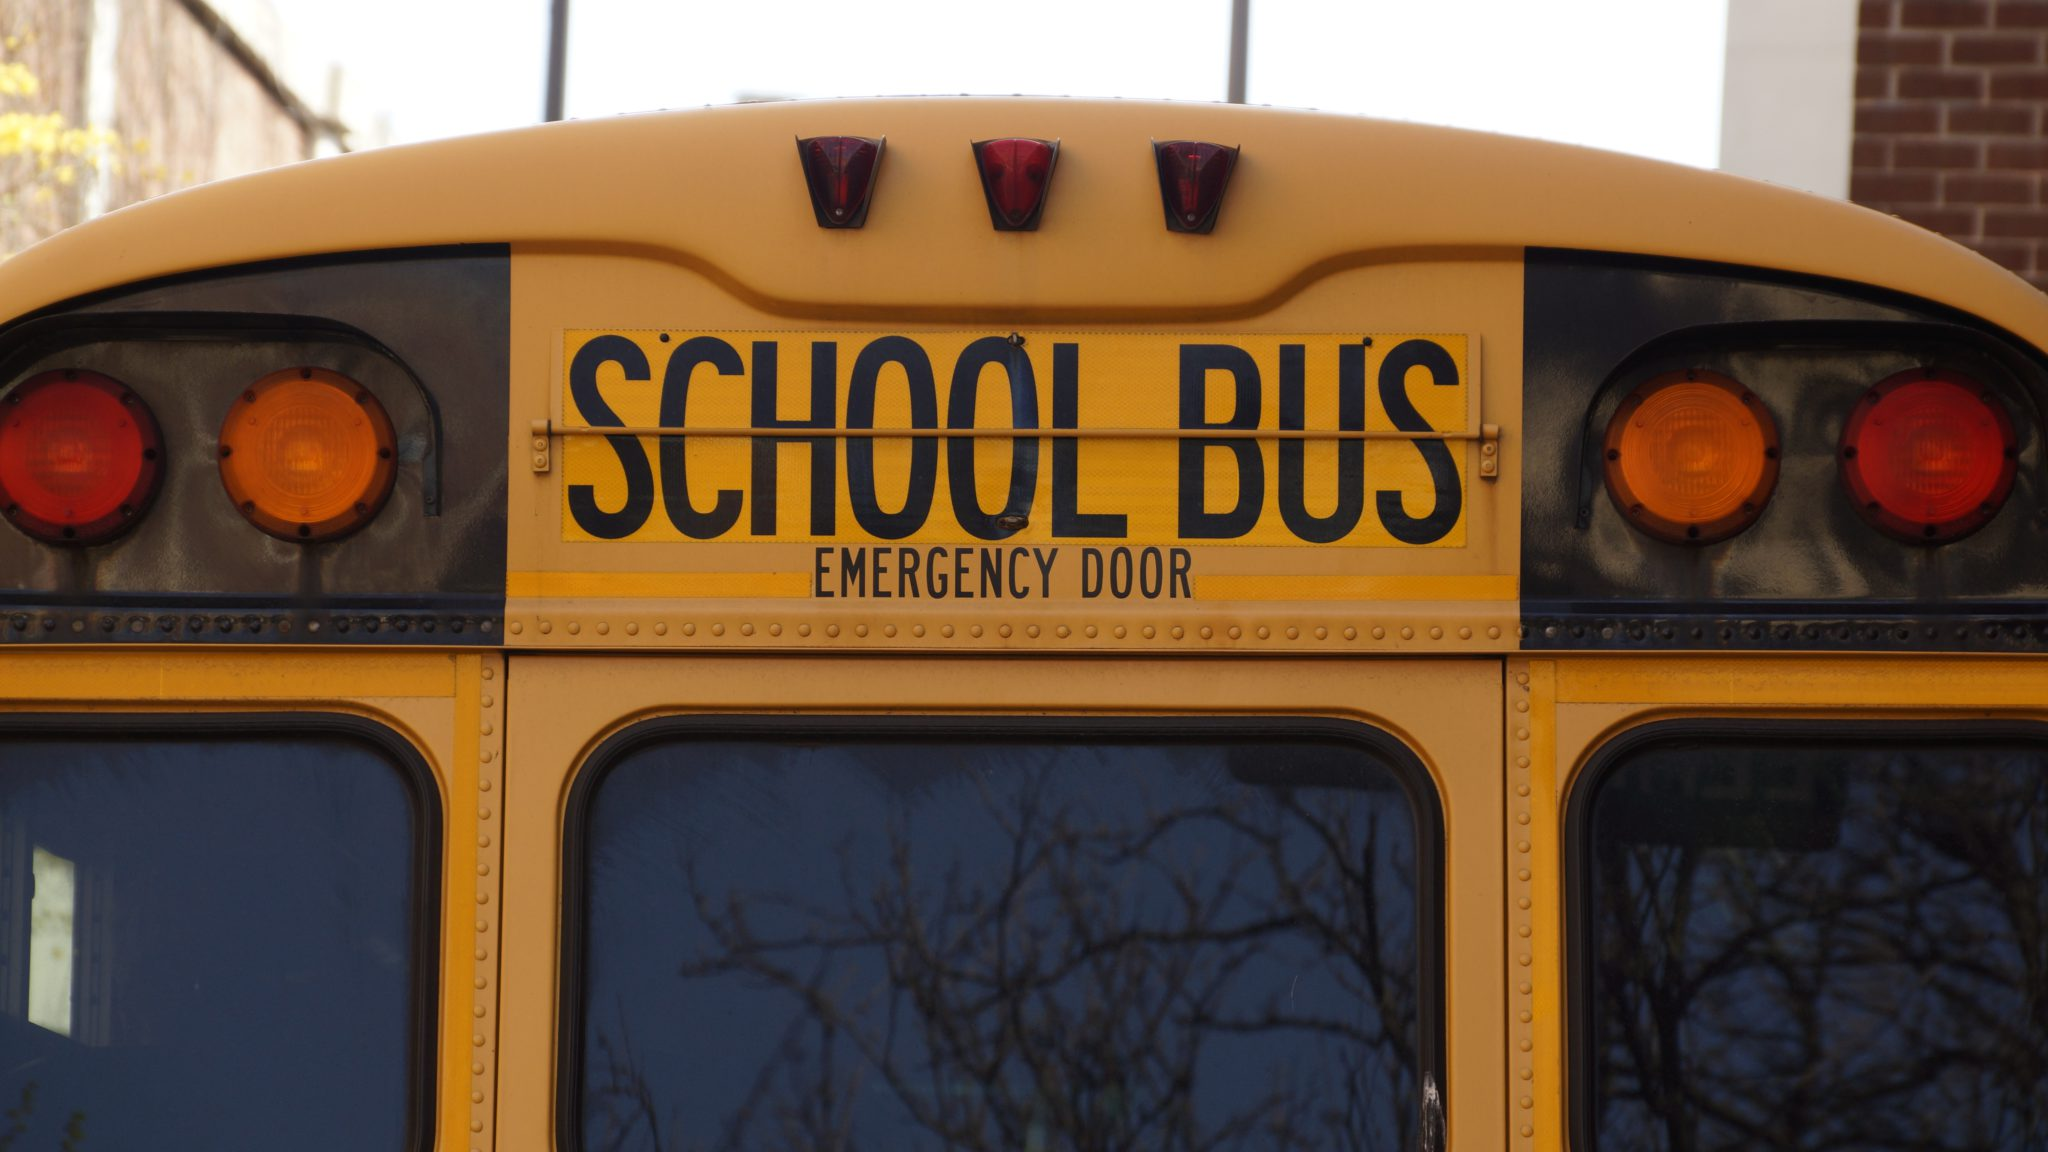 schoolbus - Home